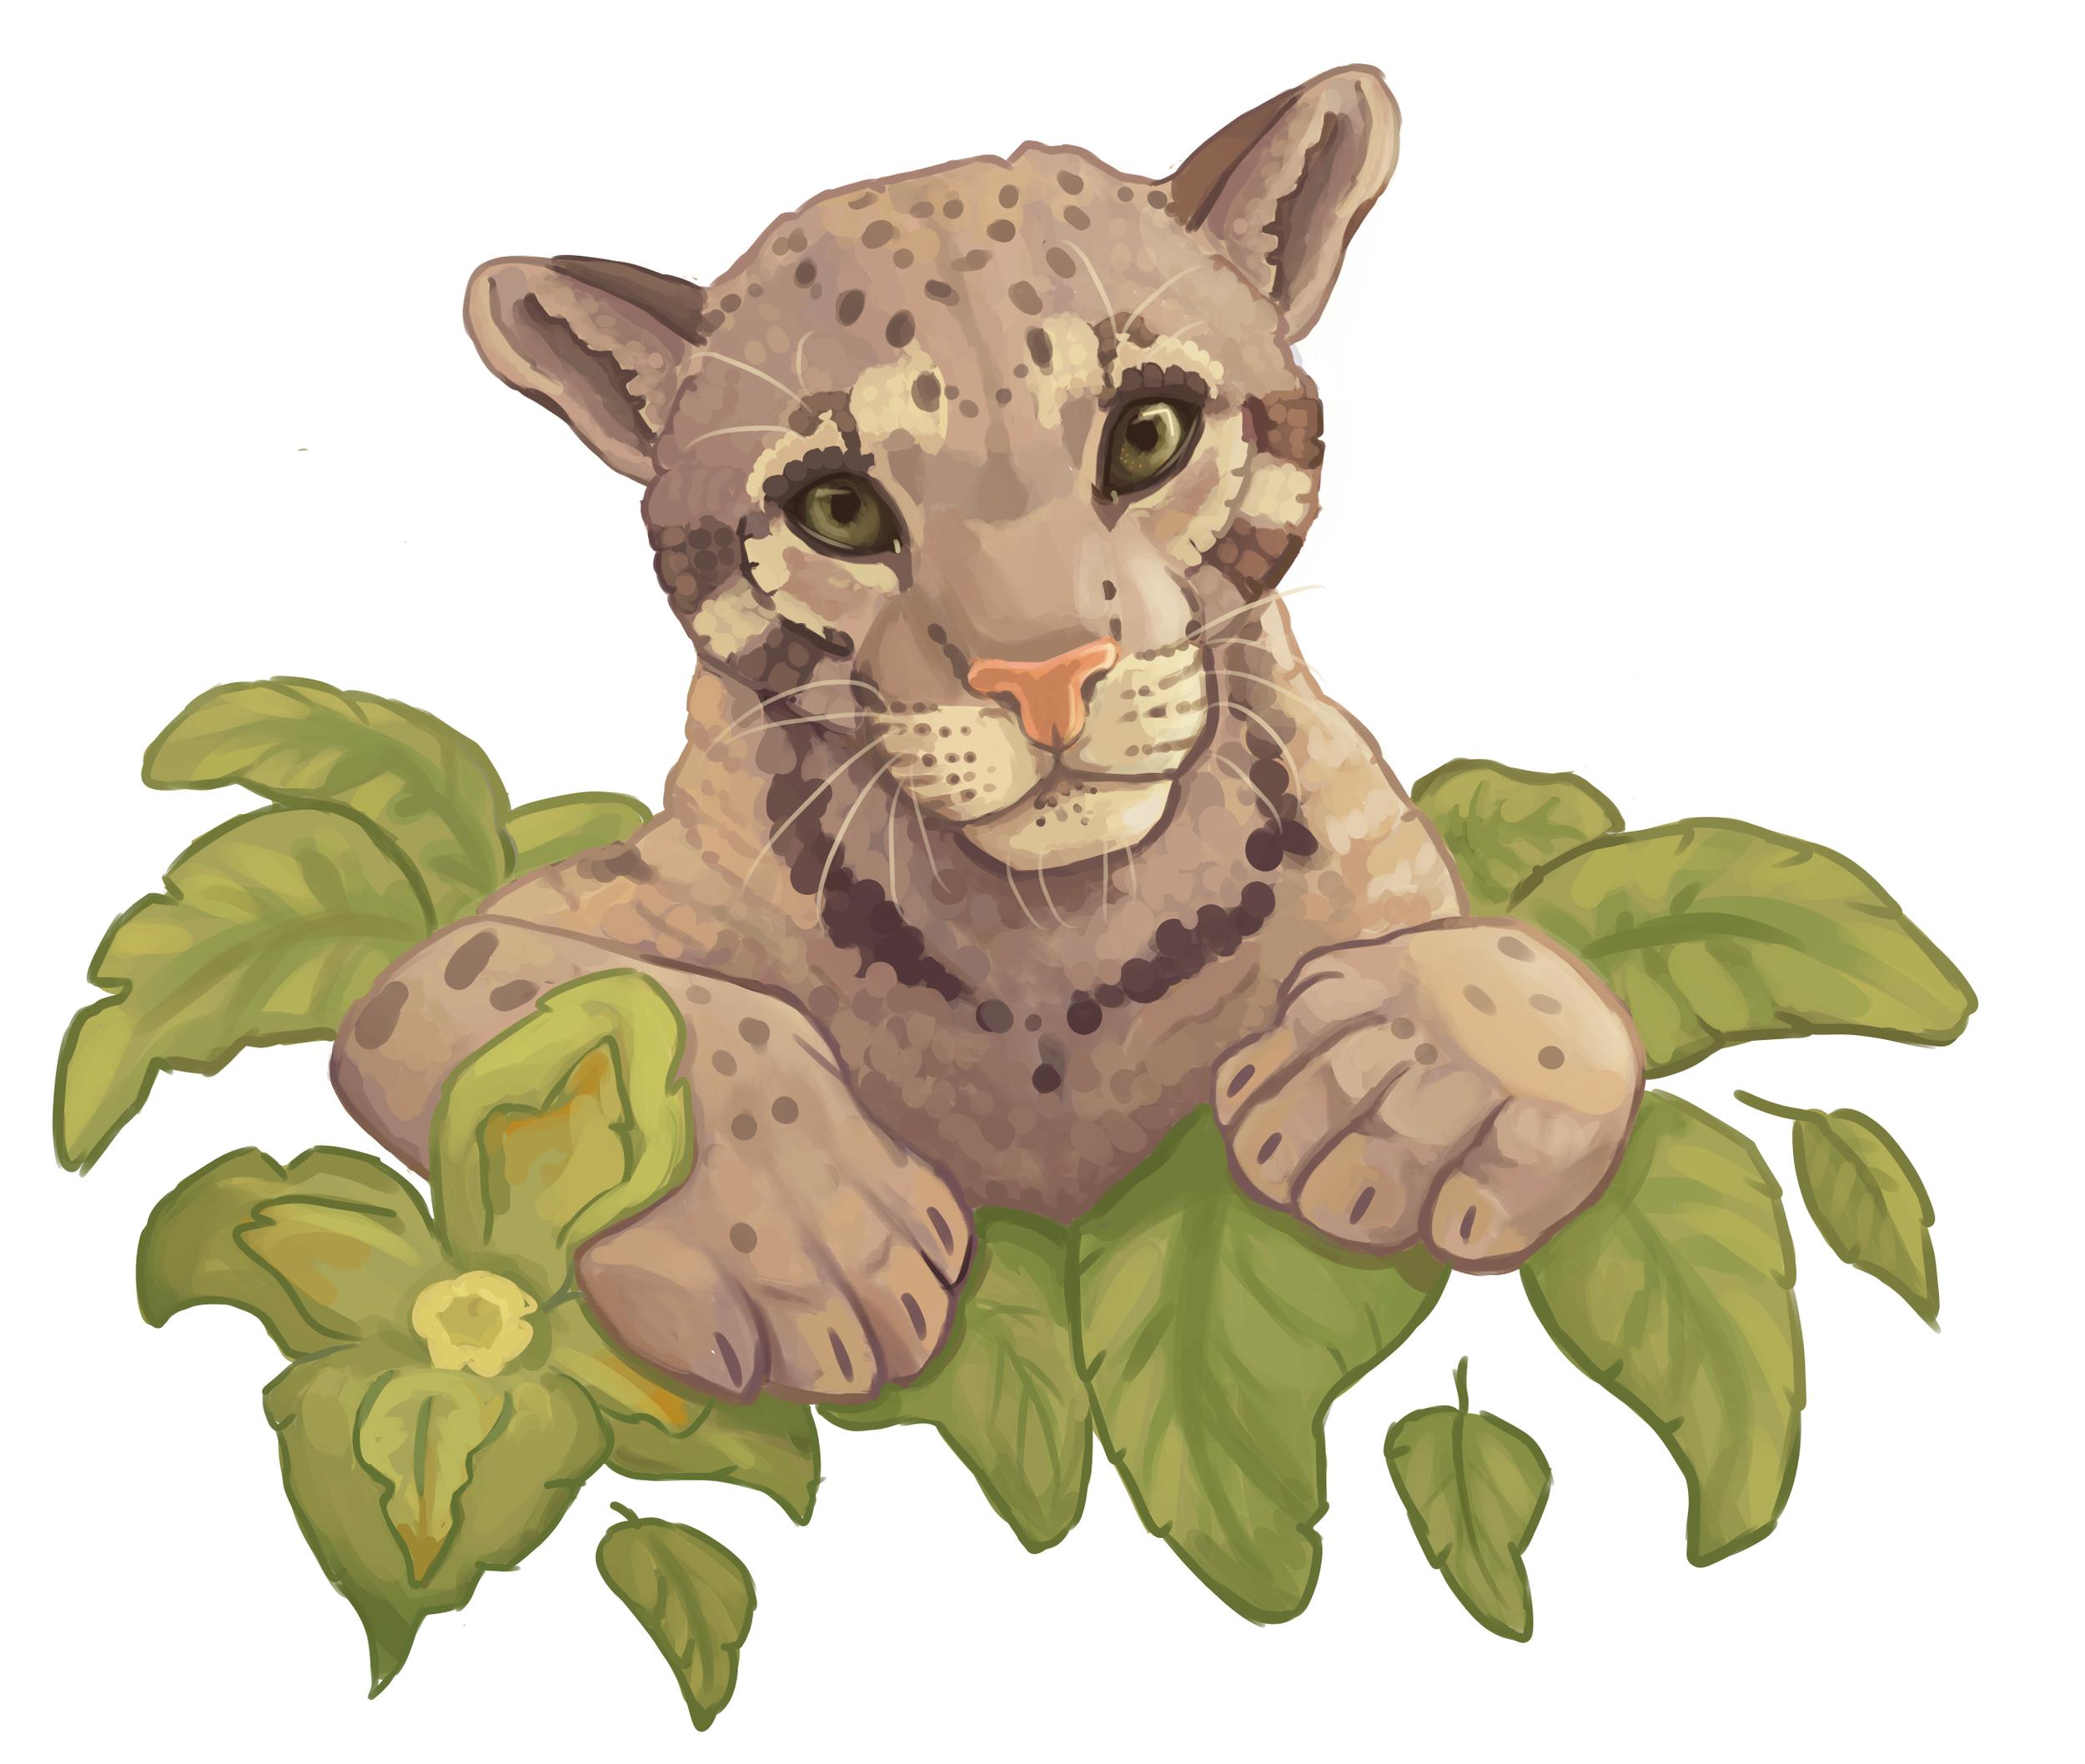 16-cloudedleopard-anna-kilvaer.png